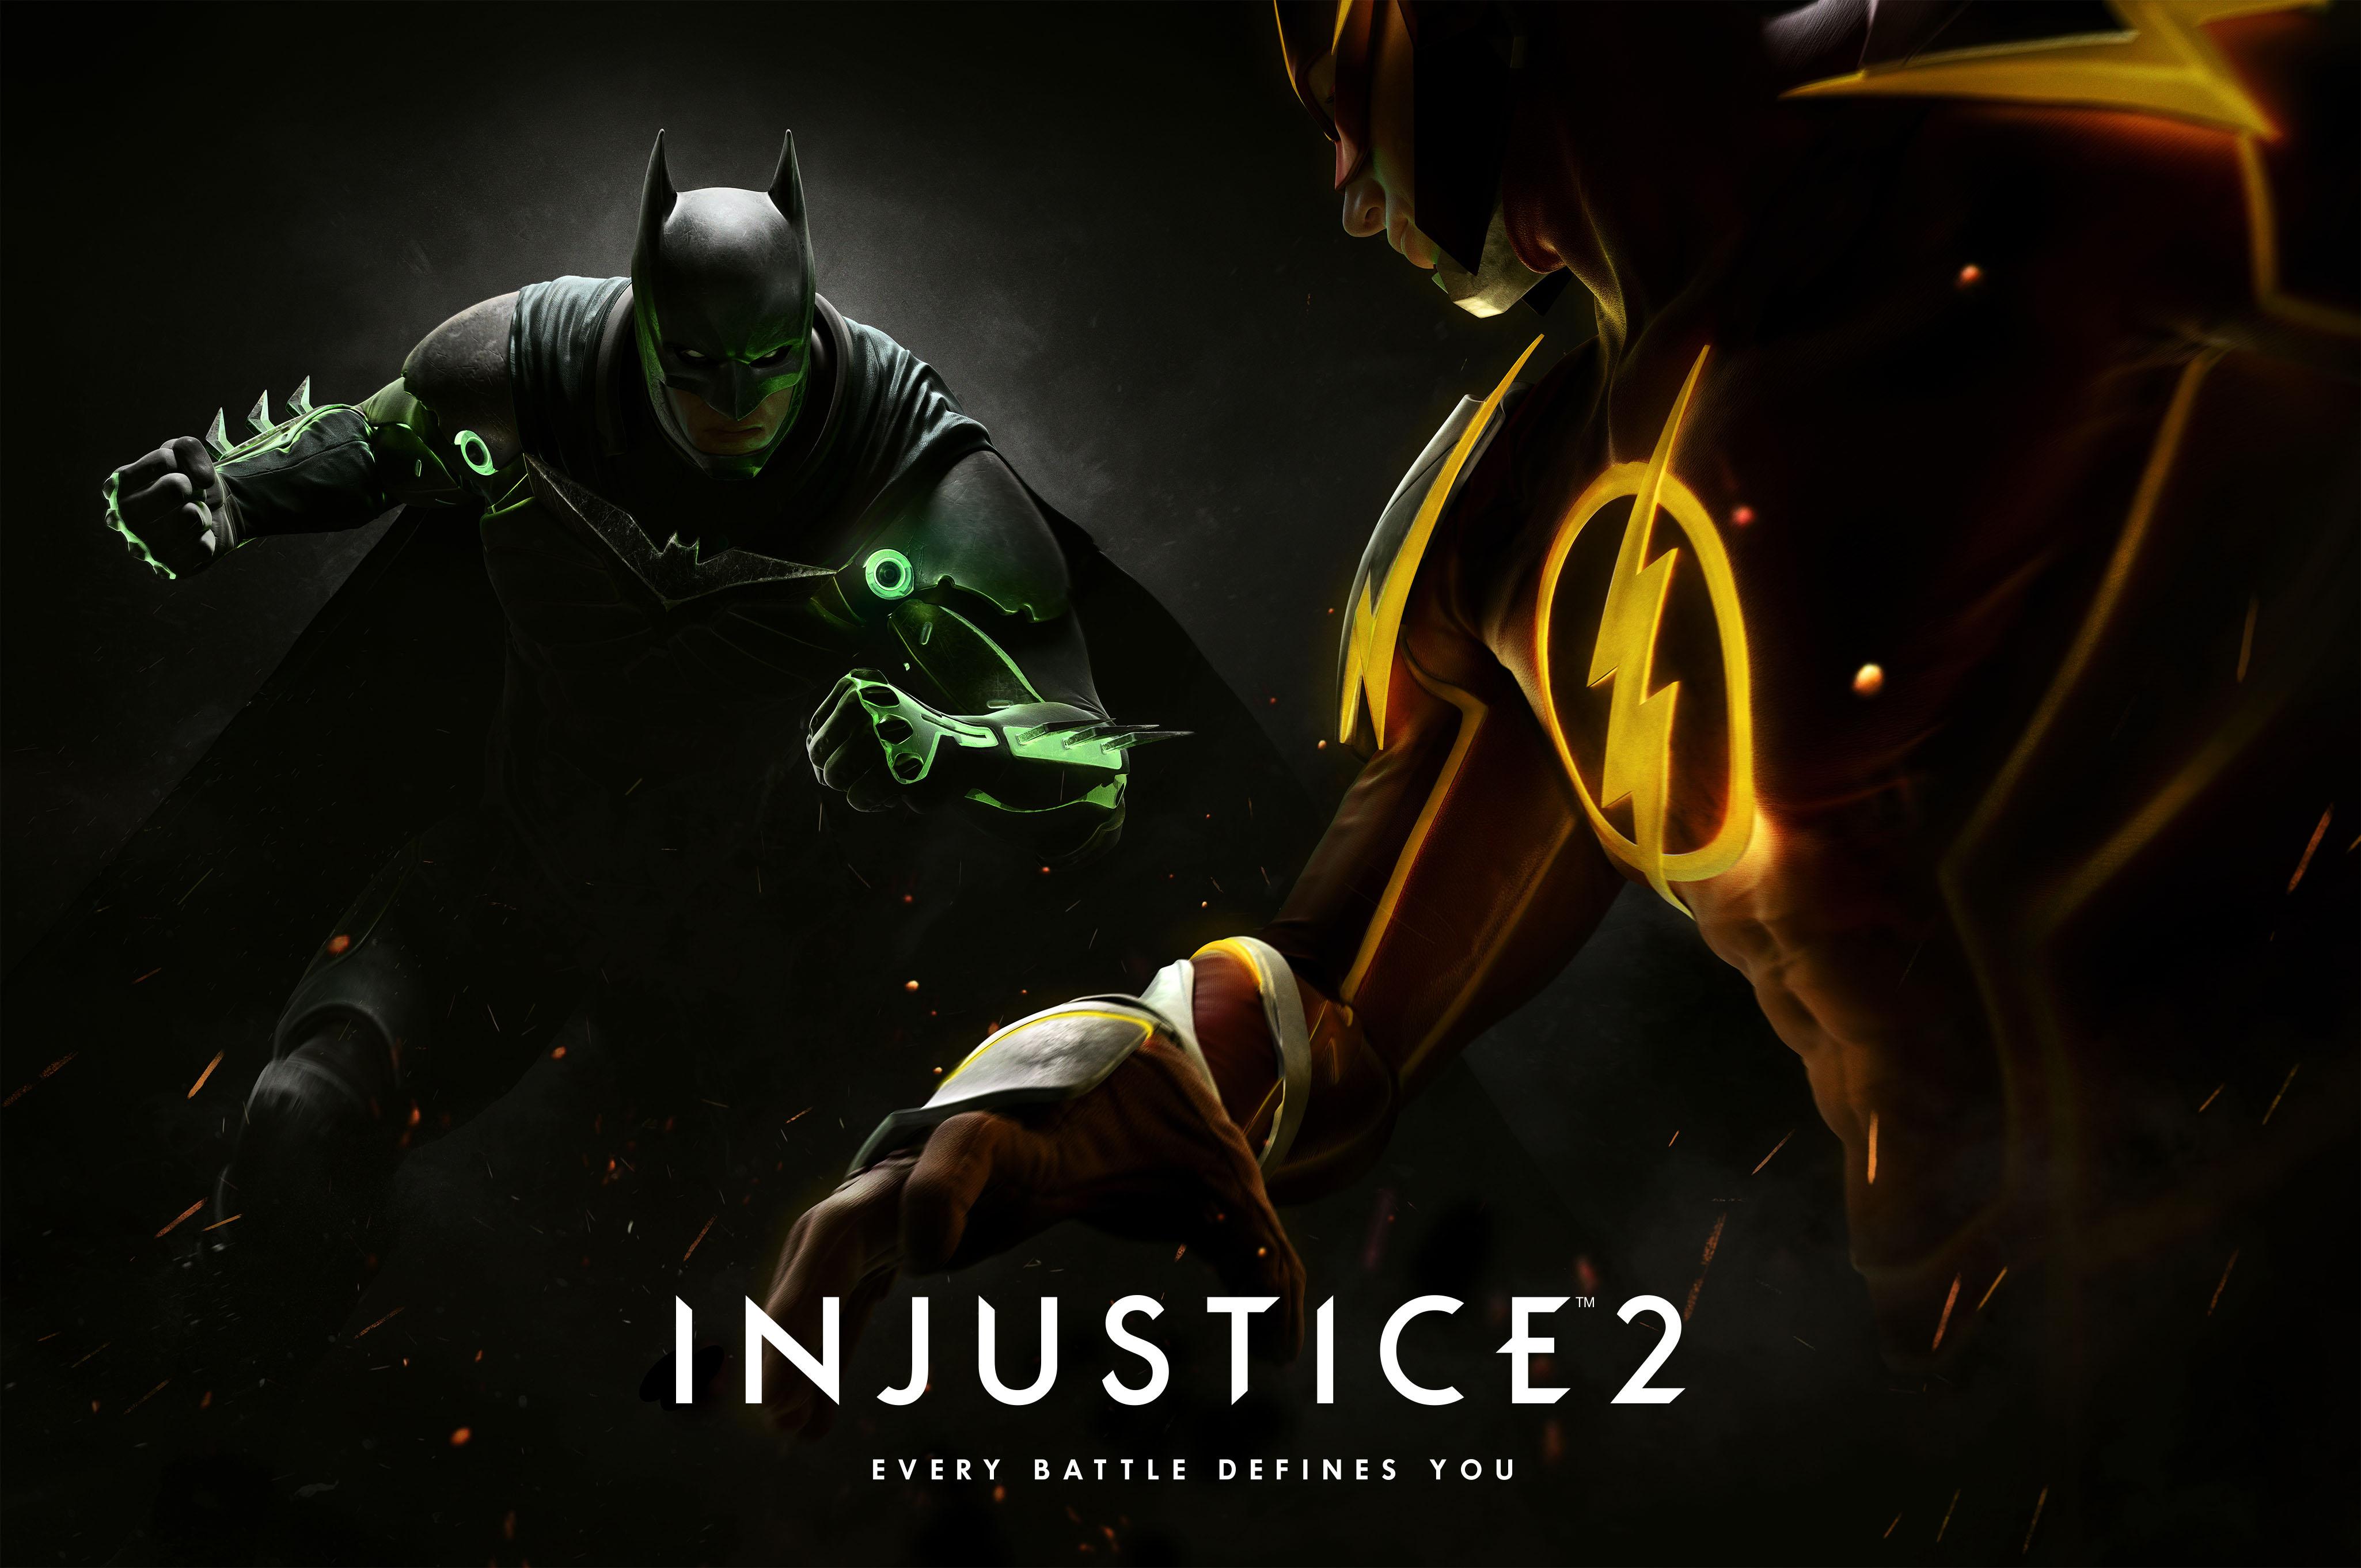 Injustice 2 - Batman vs Flash KeyArt Oficial